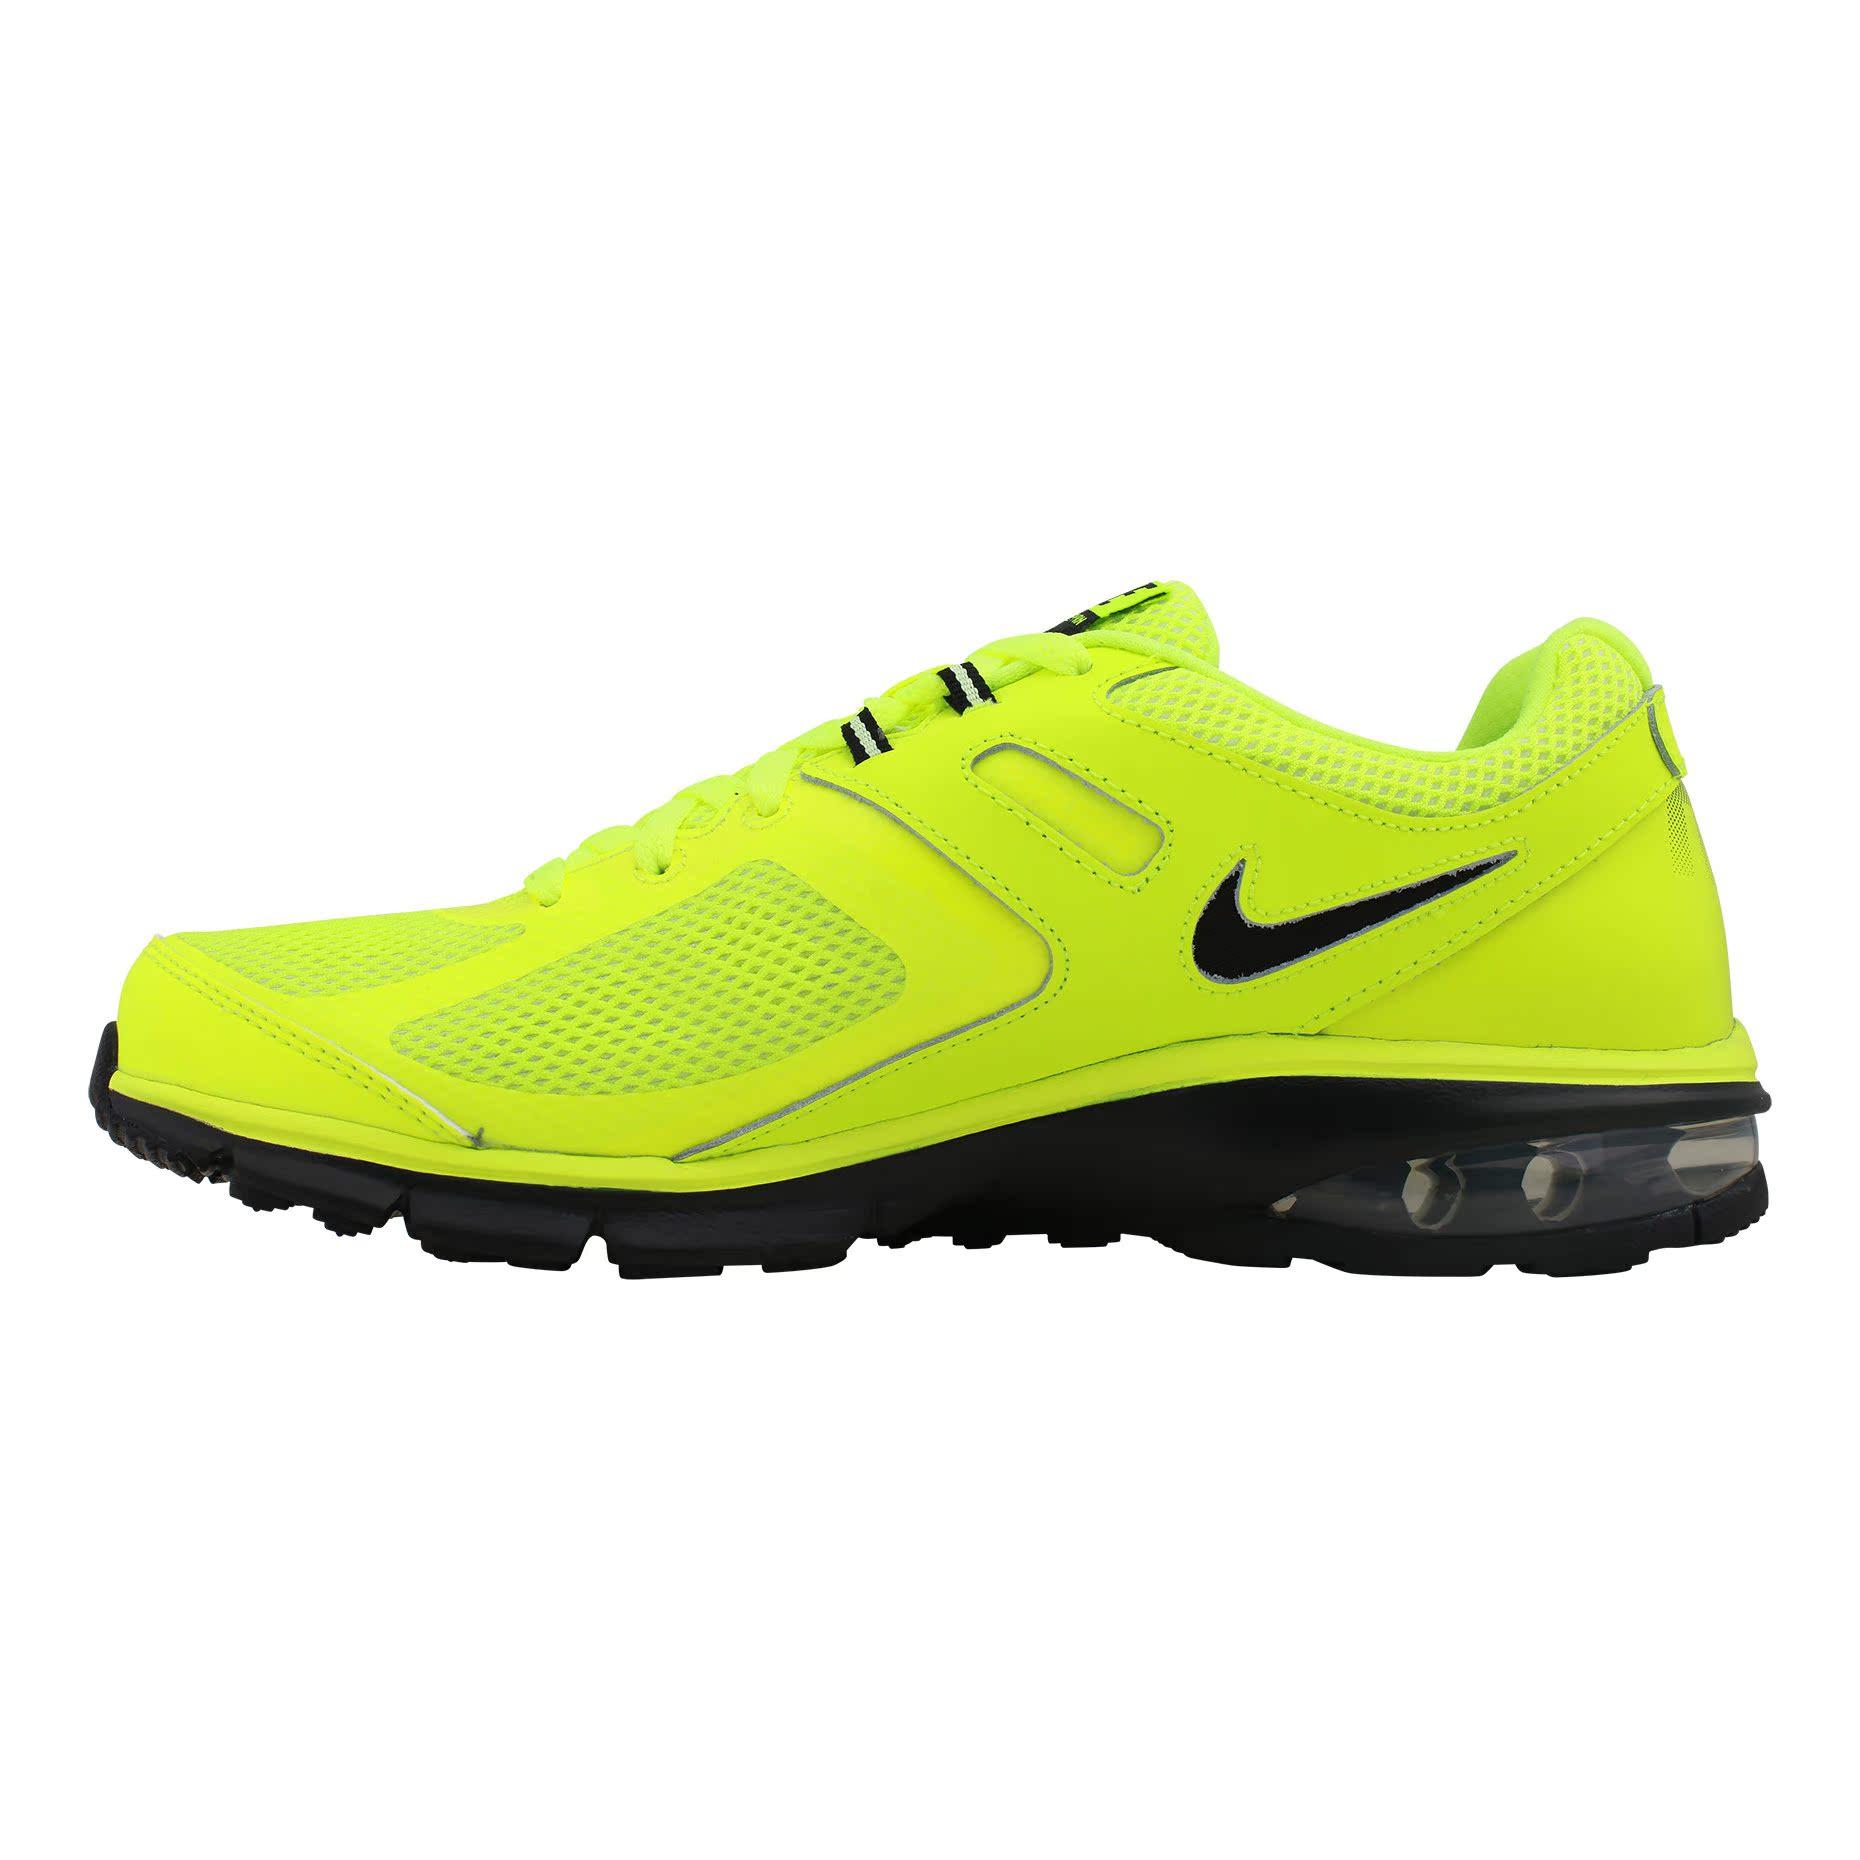 Nike Nike Official NIKE AIR MAX DEFY RN men running shoes 599,343